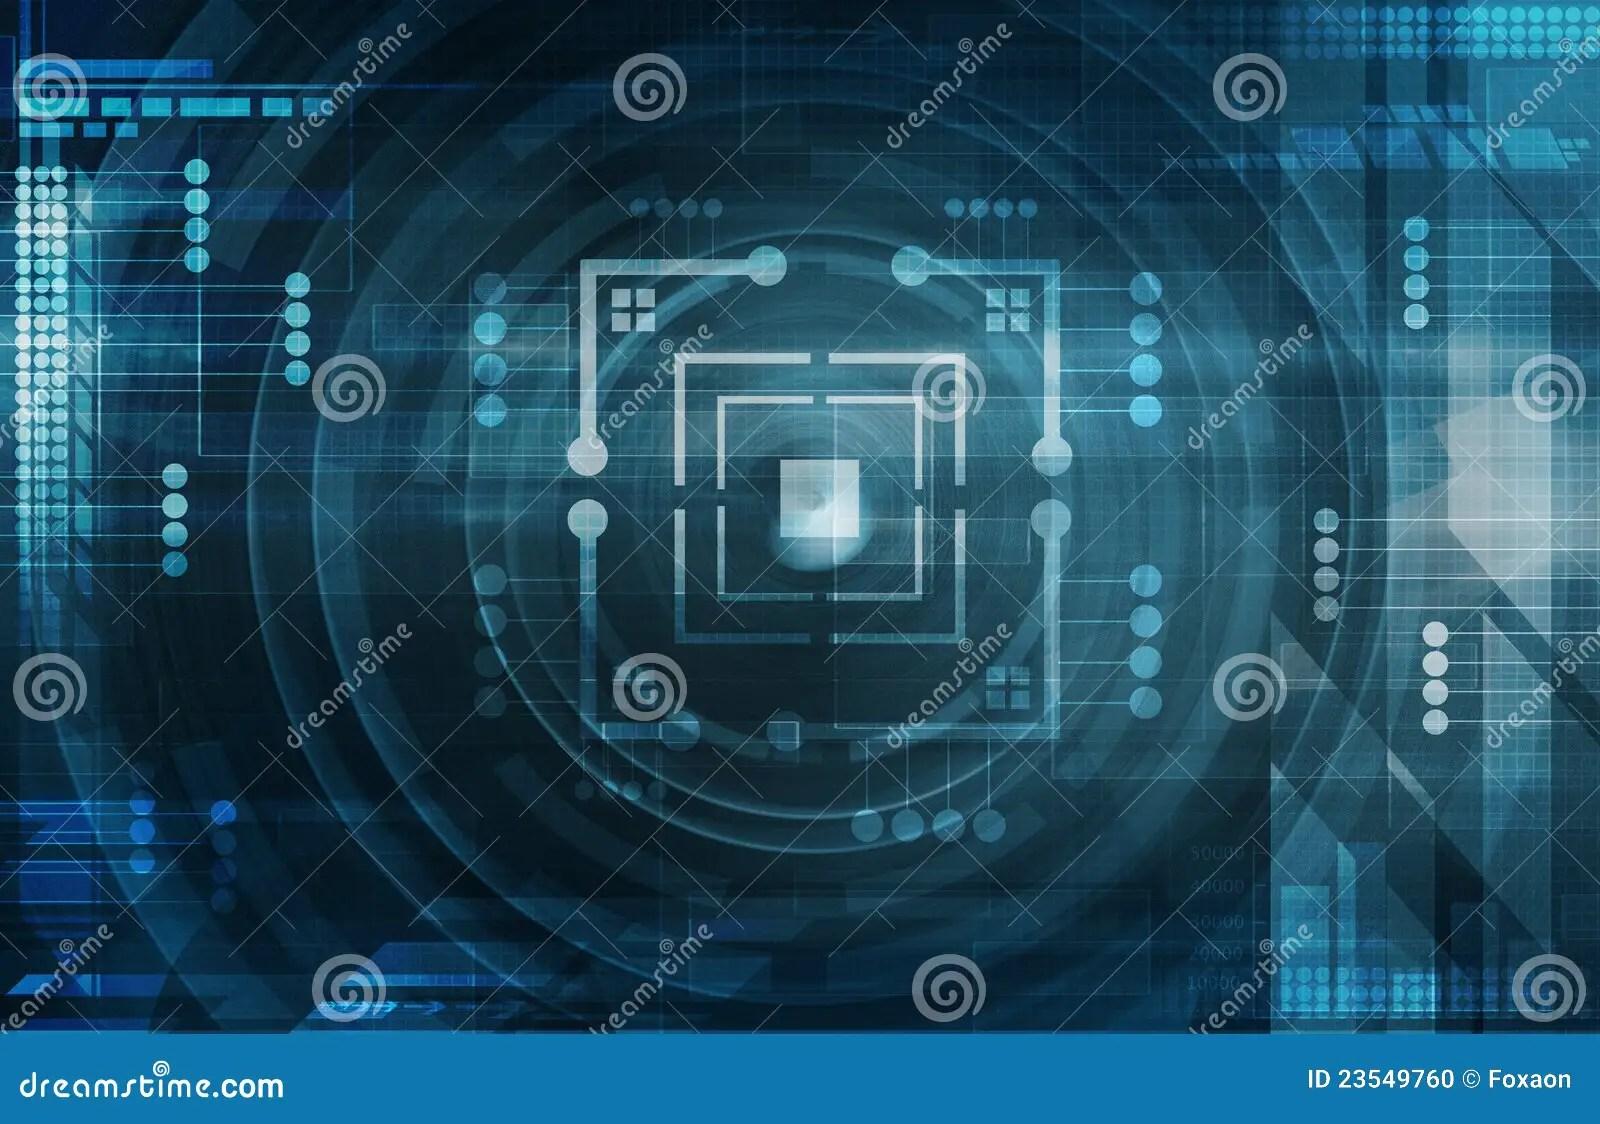 Windows 8 1 Wallpaper Hd Free Download Dark Blue Tech Background Stock Illustration Illustration